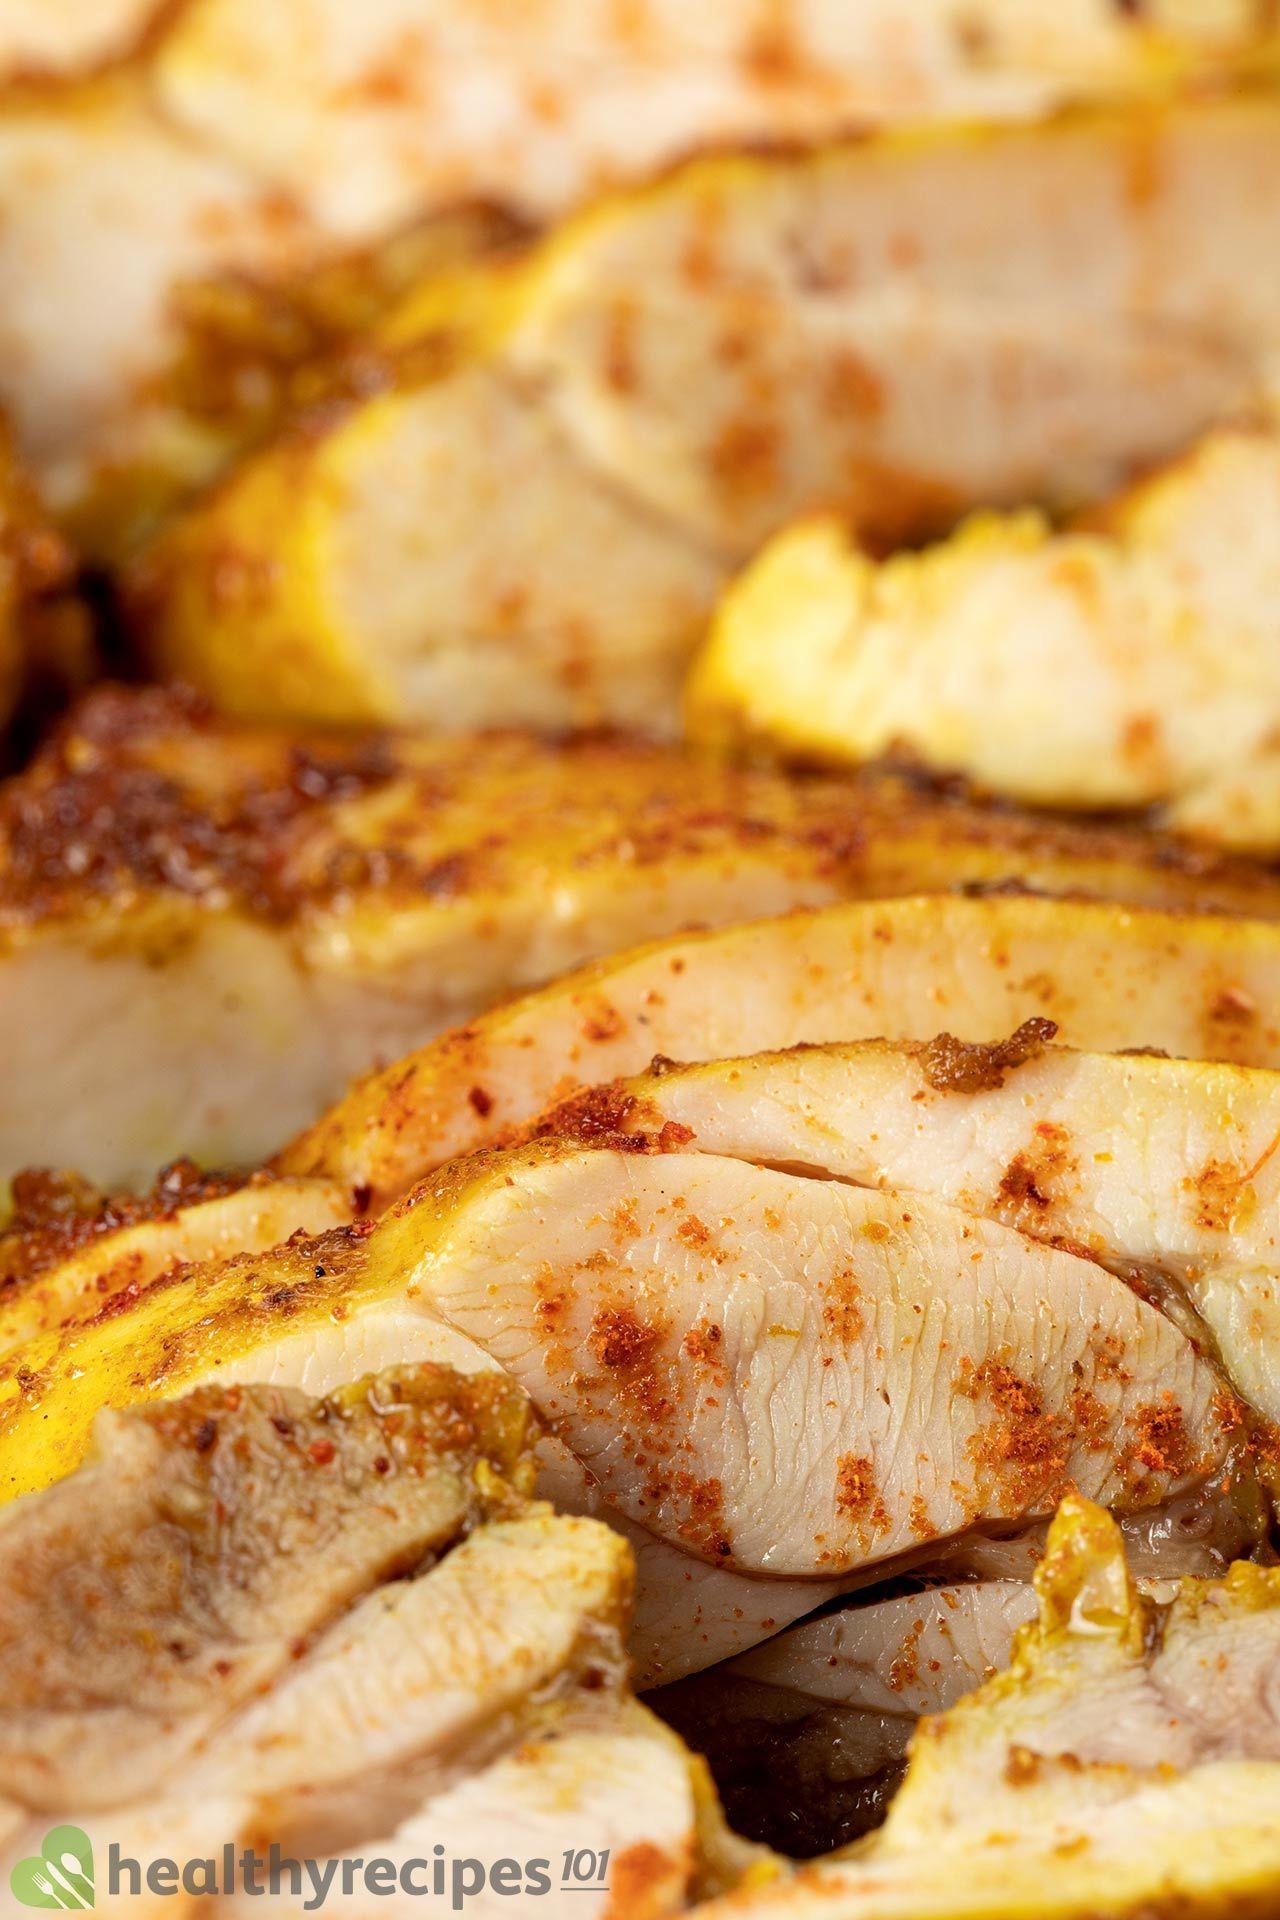 Tips for Making Juicy, Tender Meat